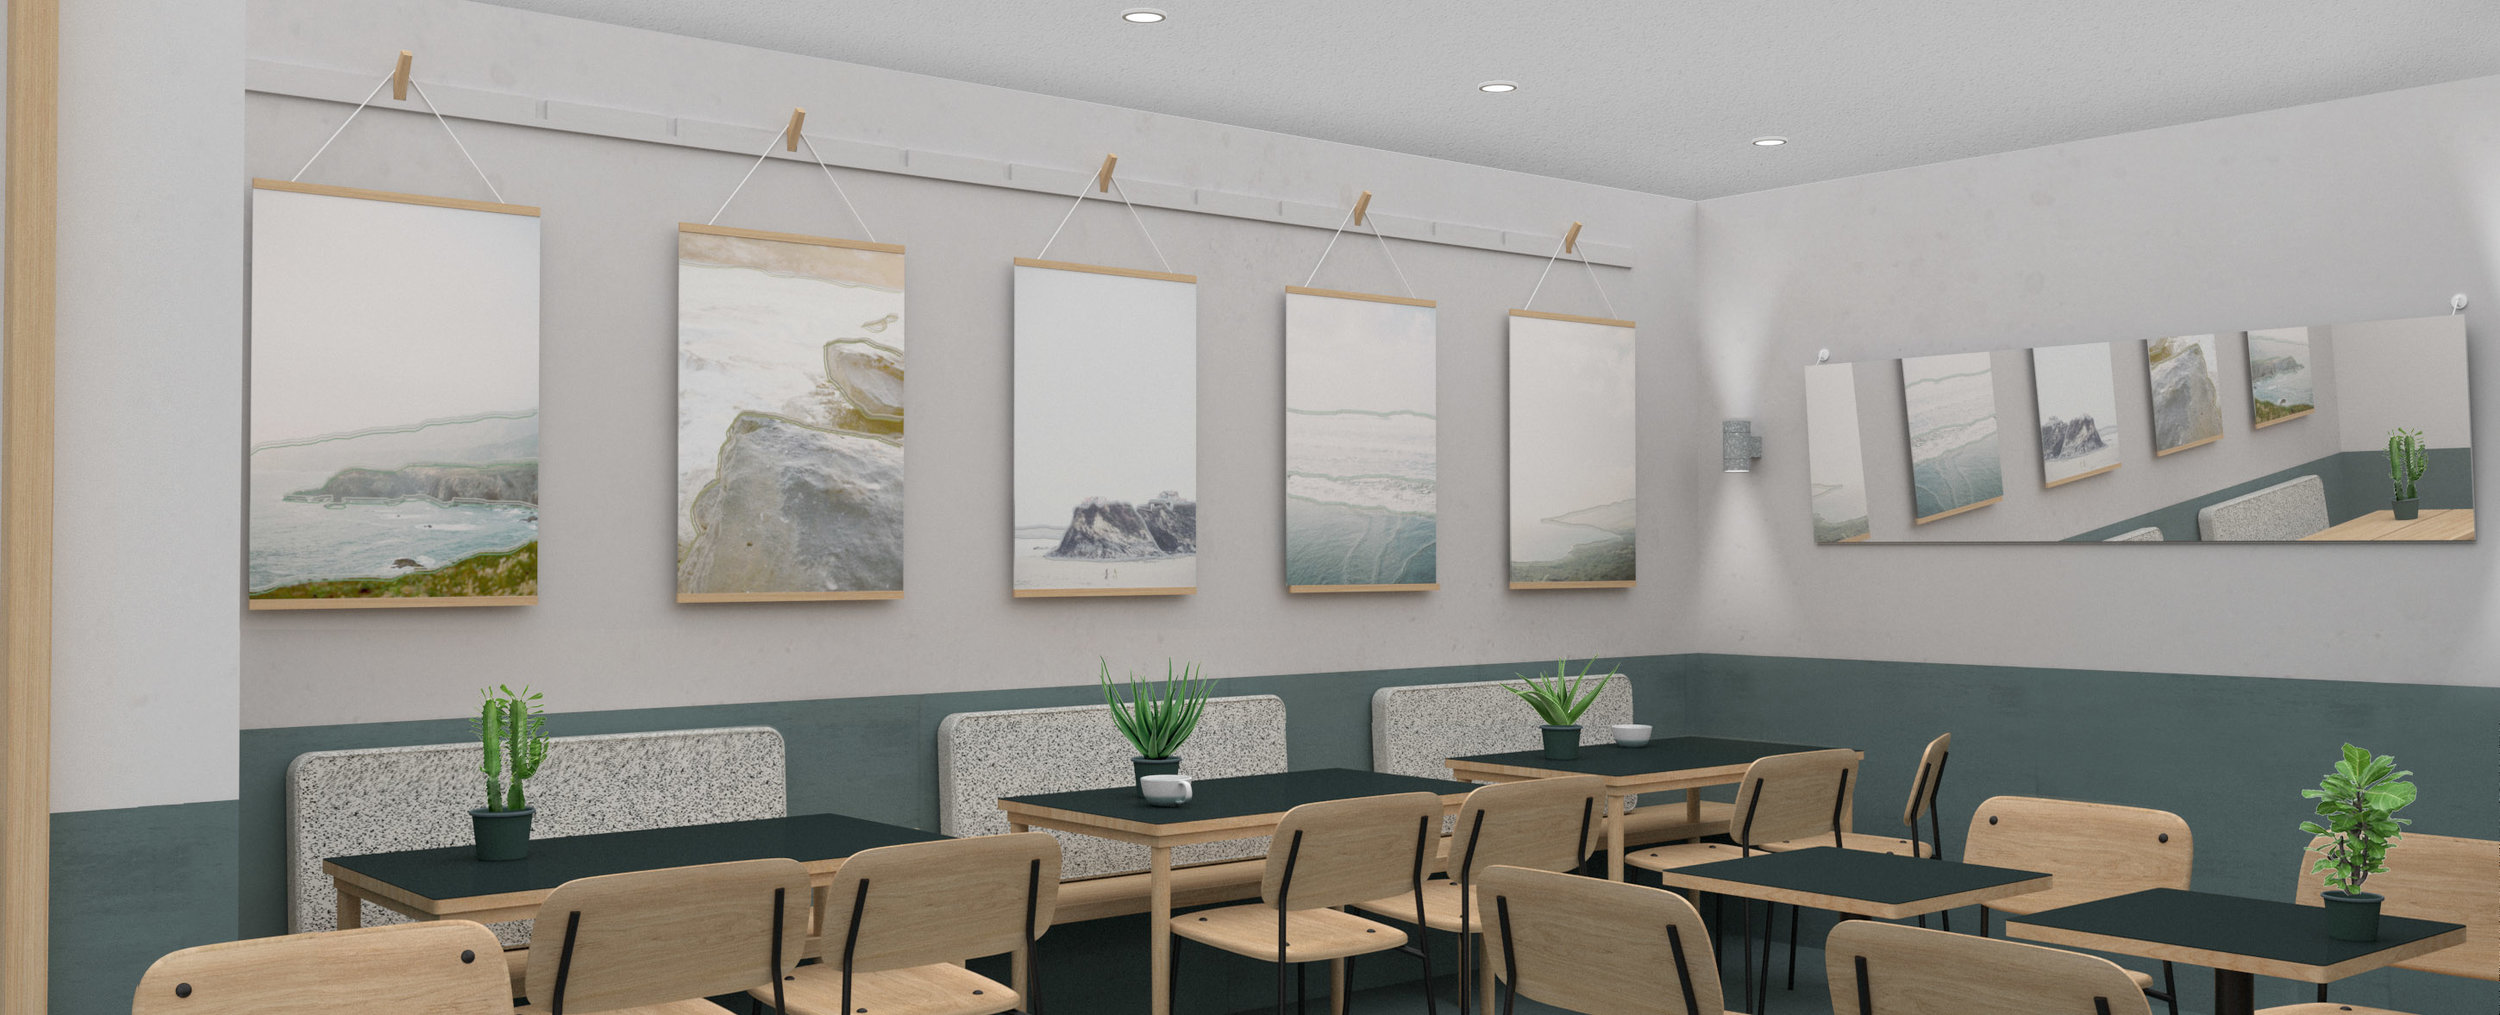 lunarlunar_interior_design_cafe_craft_coffee_banquette_hastings_view a.jpg